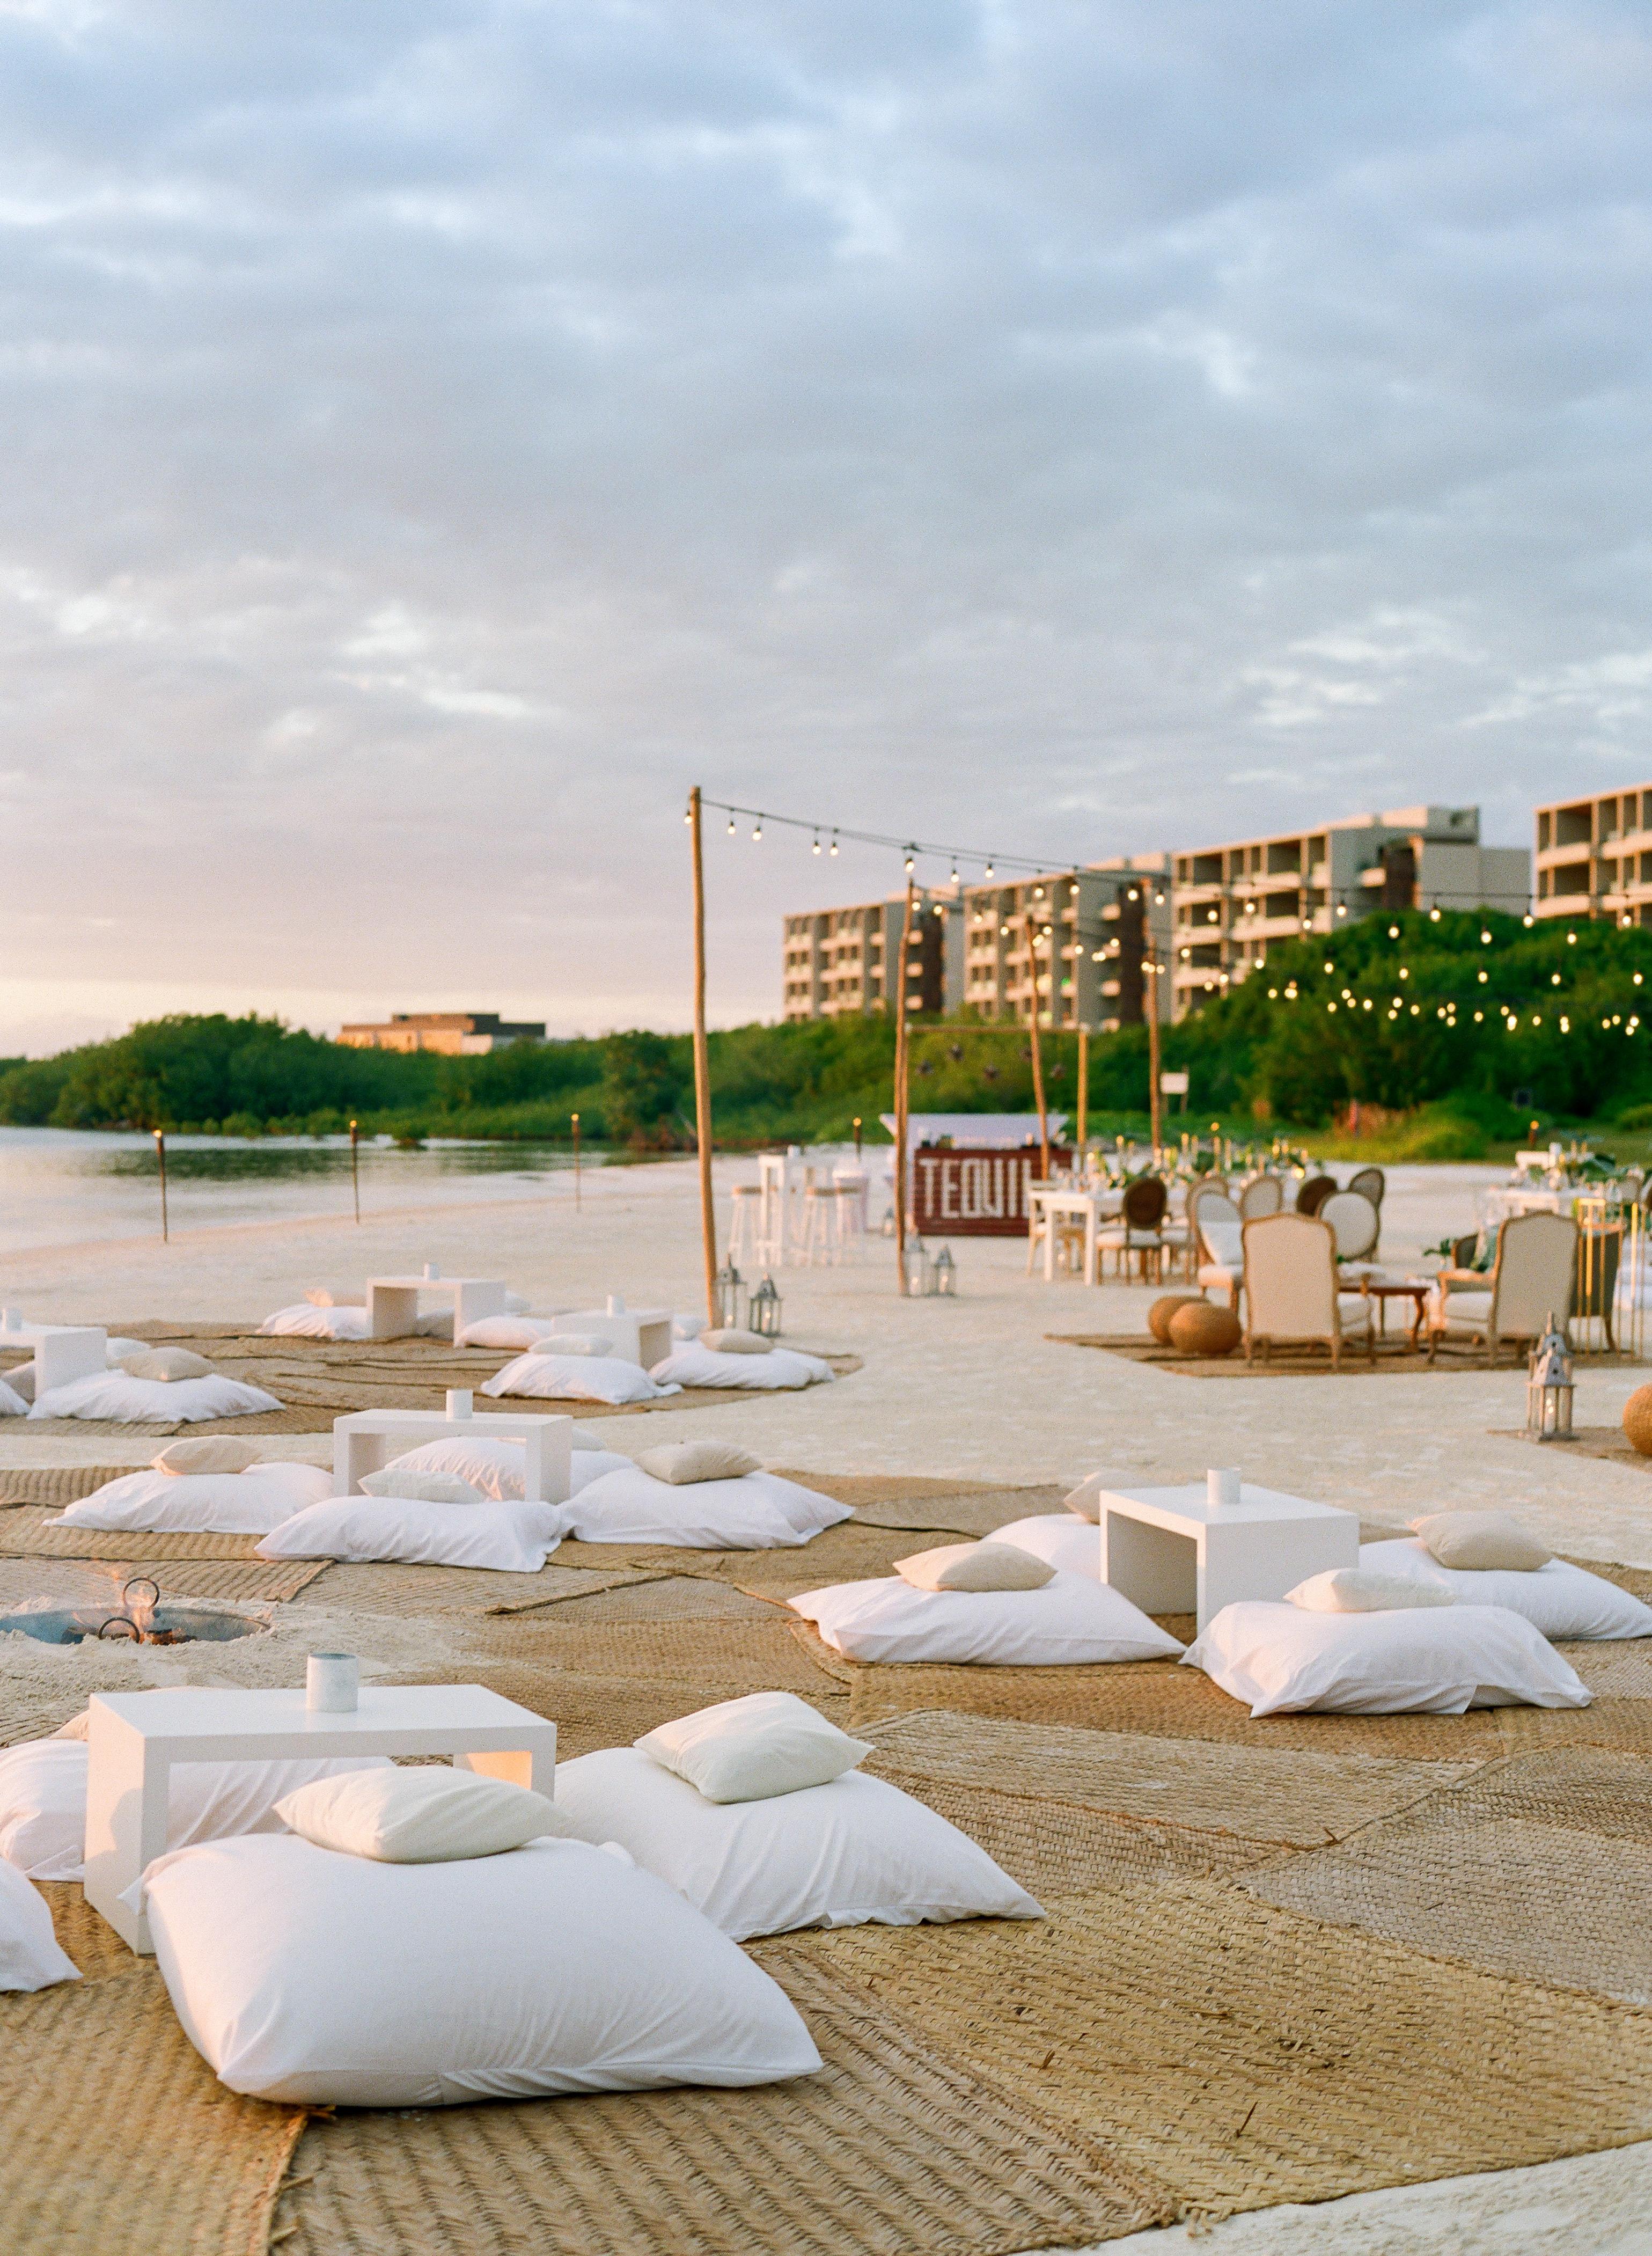 vicky james mexico beach lounge pillows